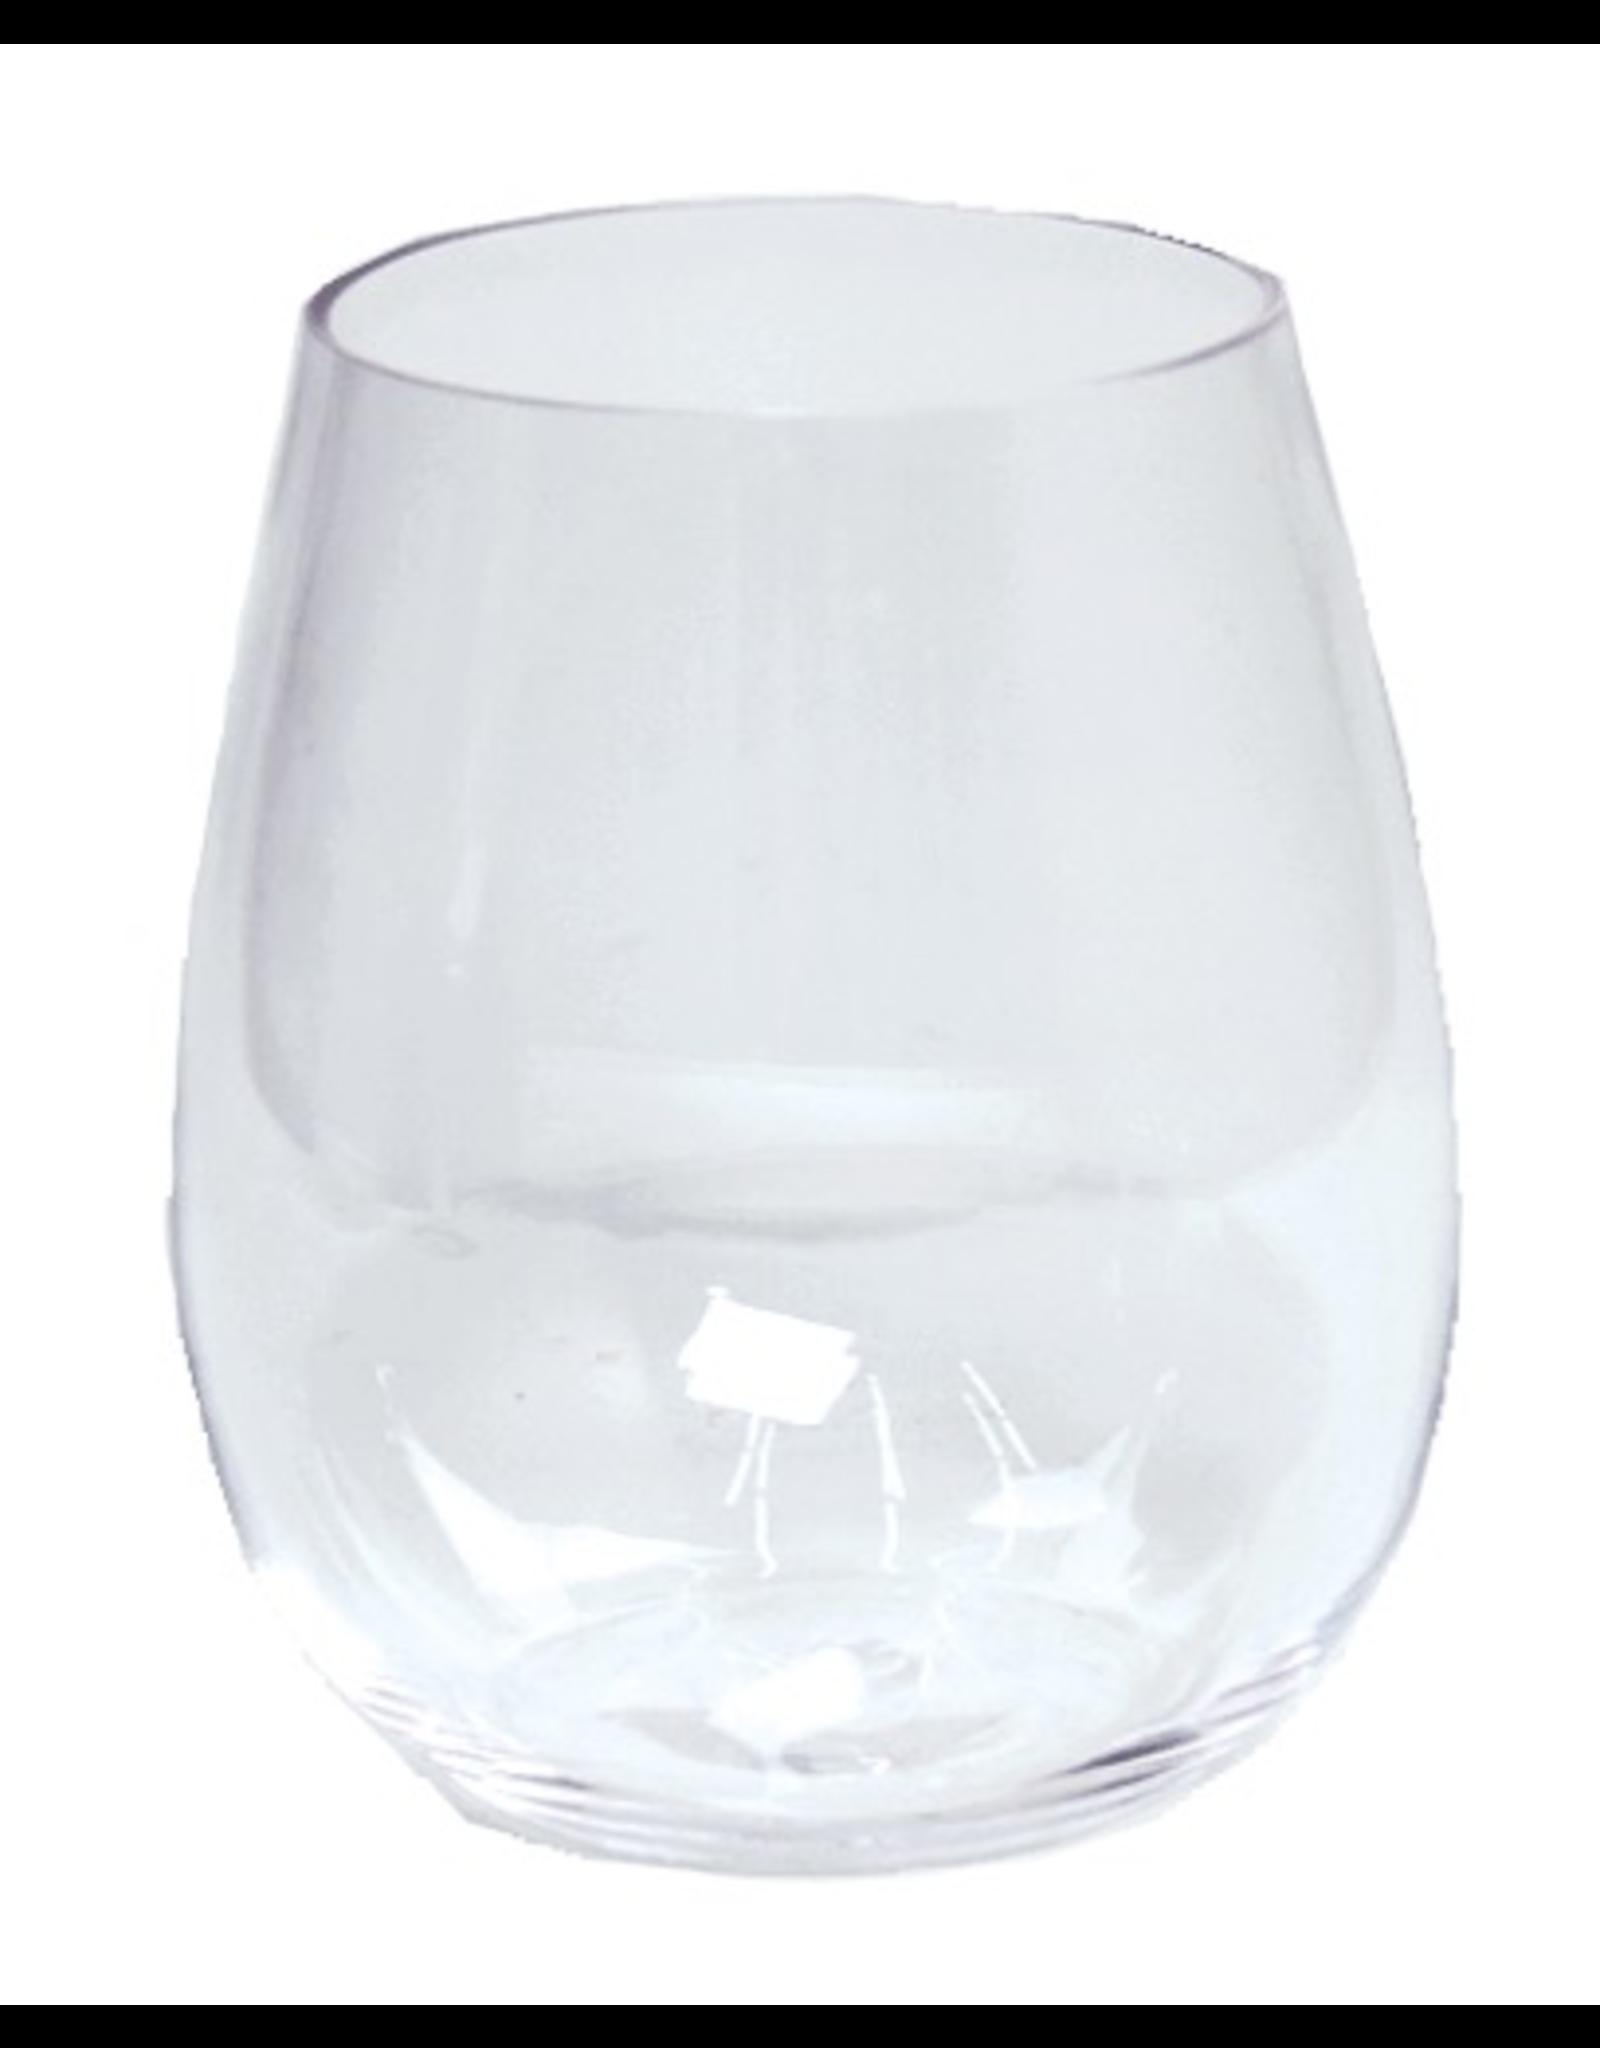 Caspari Acrylic Stemless Wine Glass 14oz Shatter Resistant BPA Free